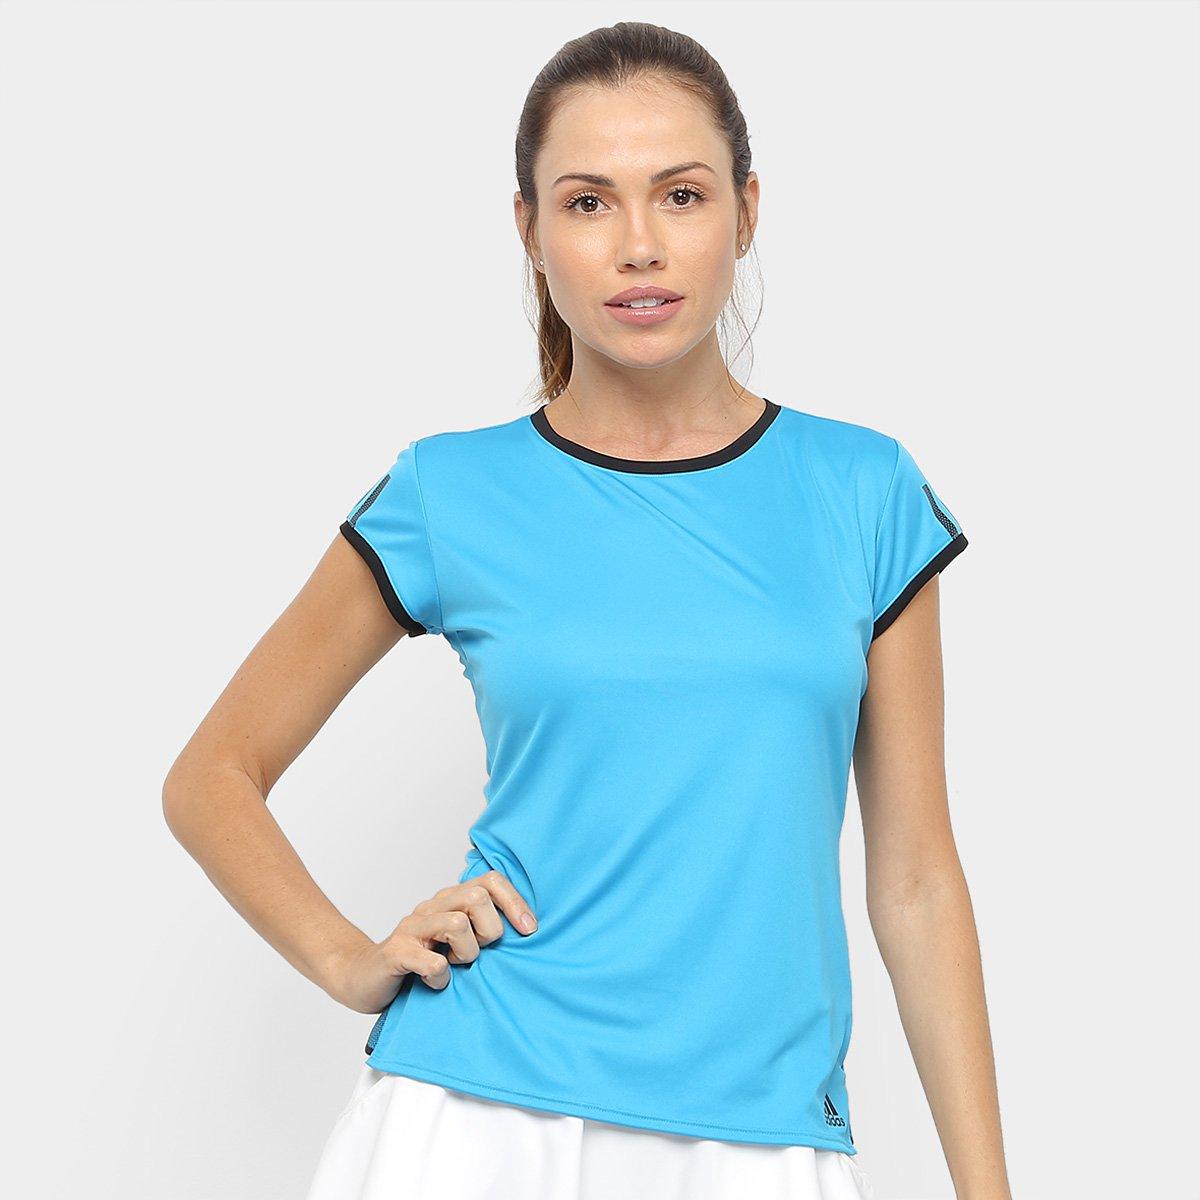 Camiseta Adidas Club 3S Tee Feminina